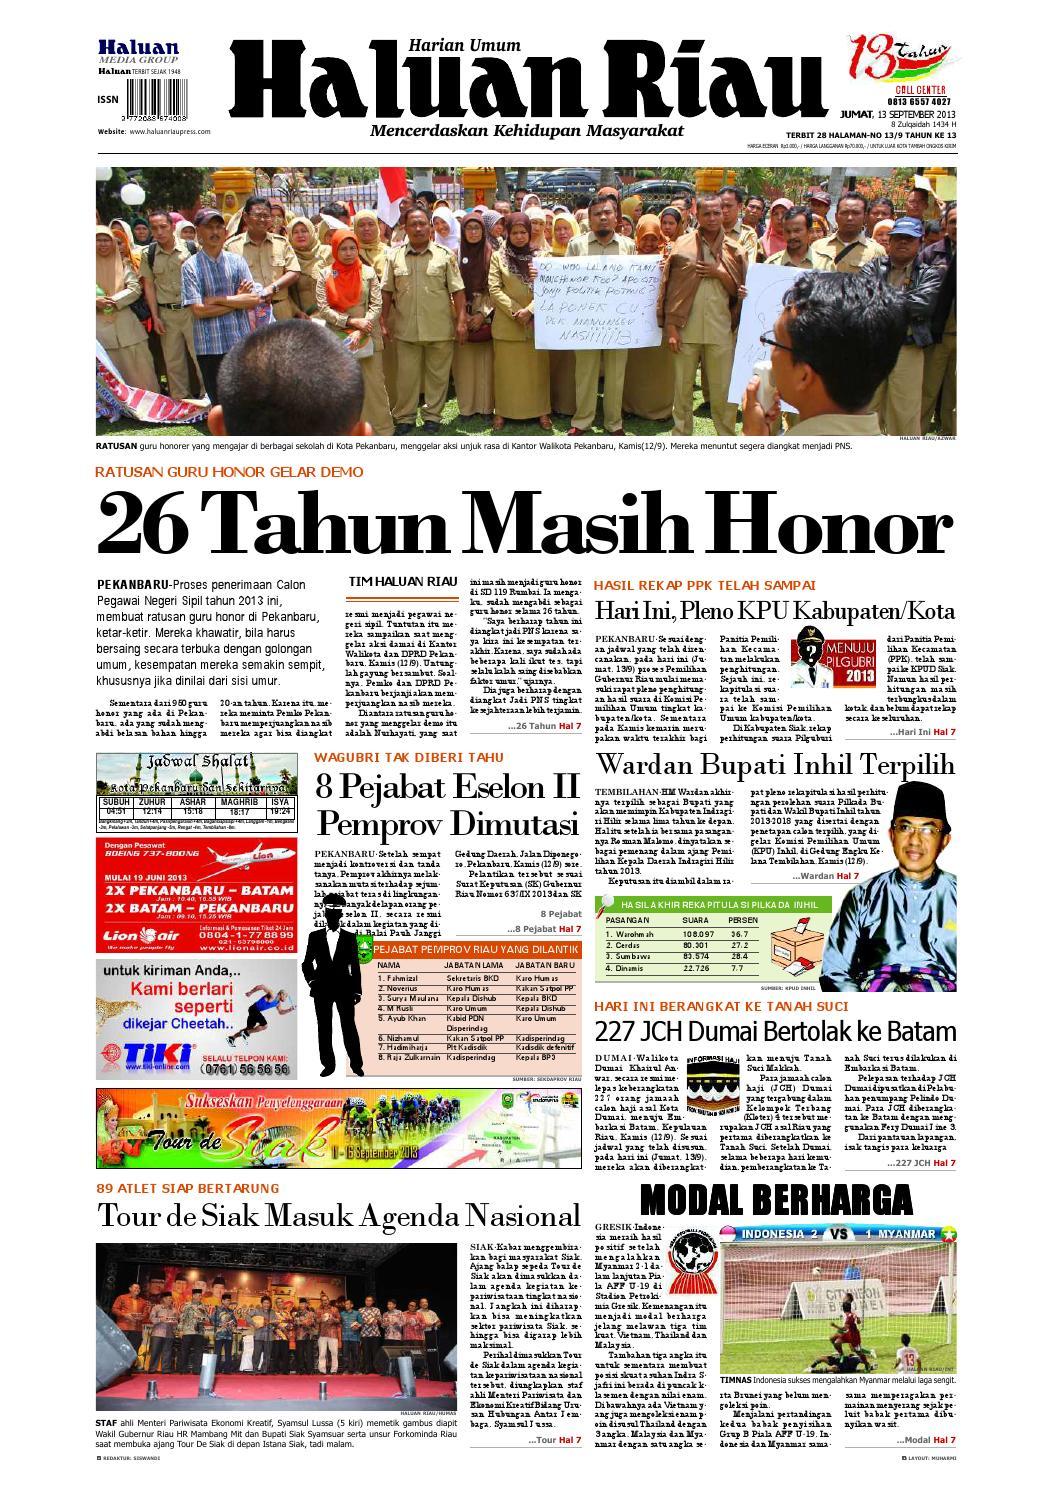 Haluanriau 2013 09 13 By Haluan Riau Issuu Produk Ukm Bumn Tas Ransel Threepoint